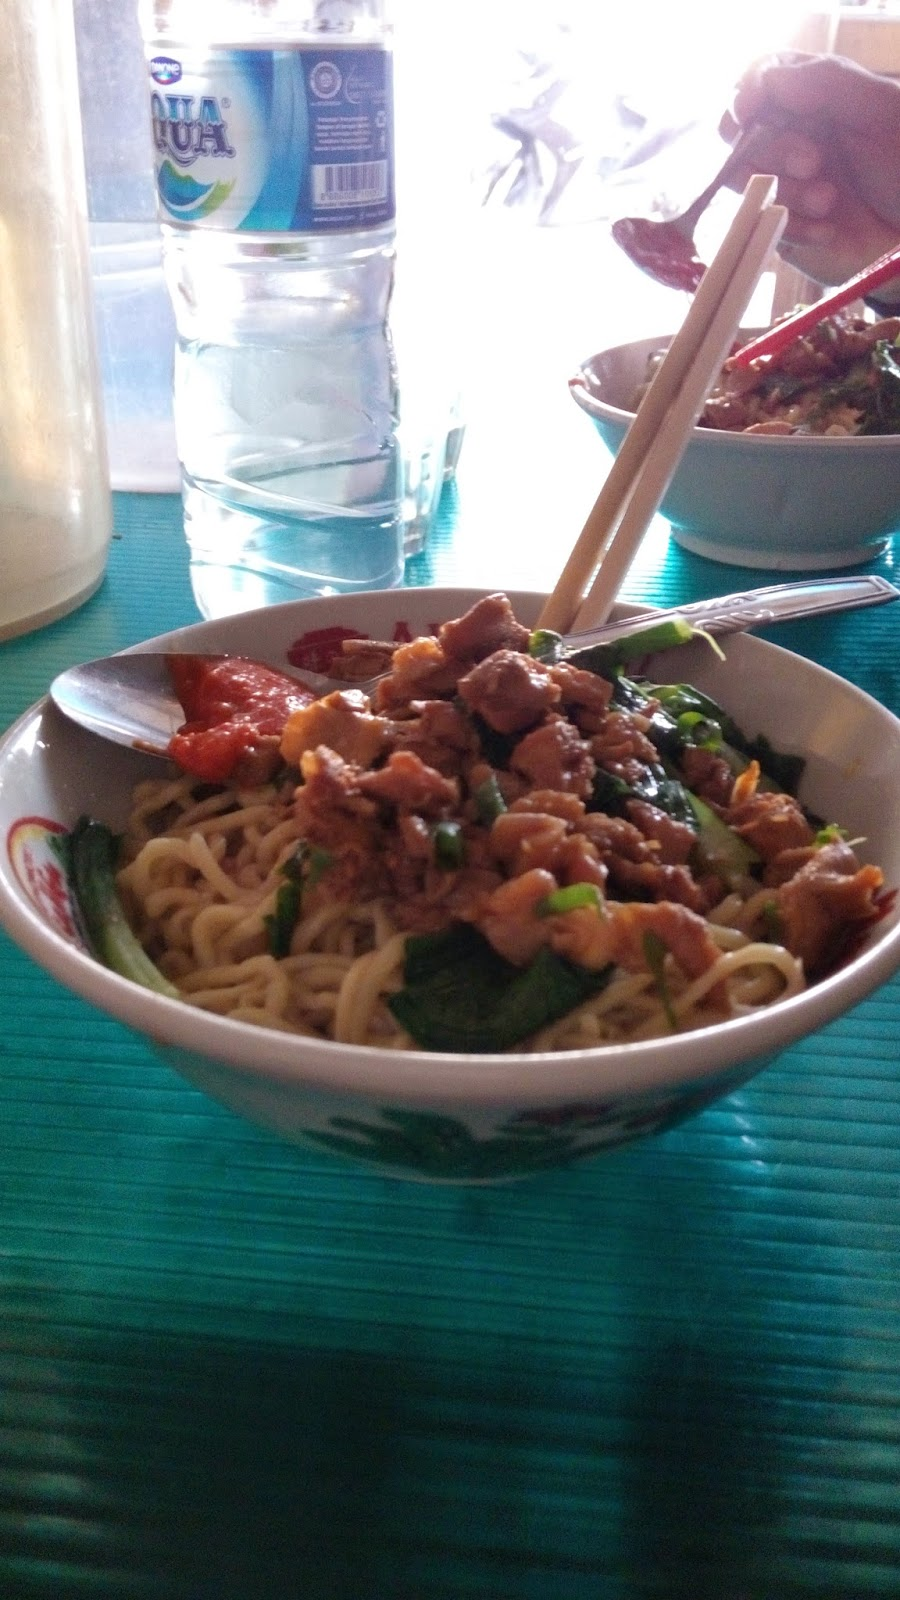 Makanan Kaki Lima Yang Wajib Kamu Coba Di Sepanjang Jalan Raya Bogor